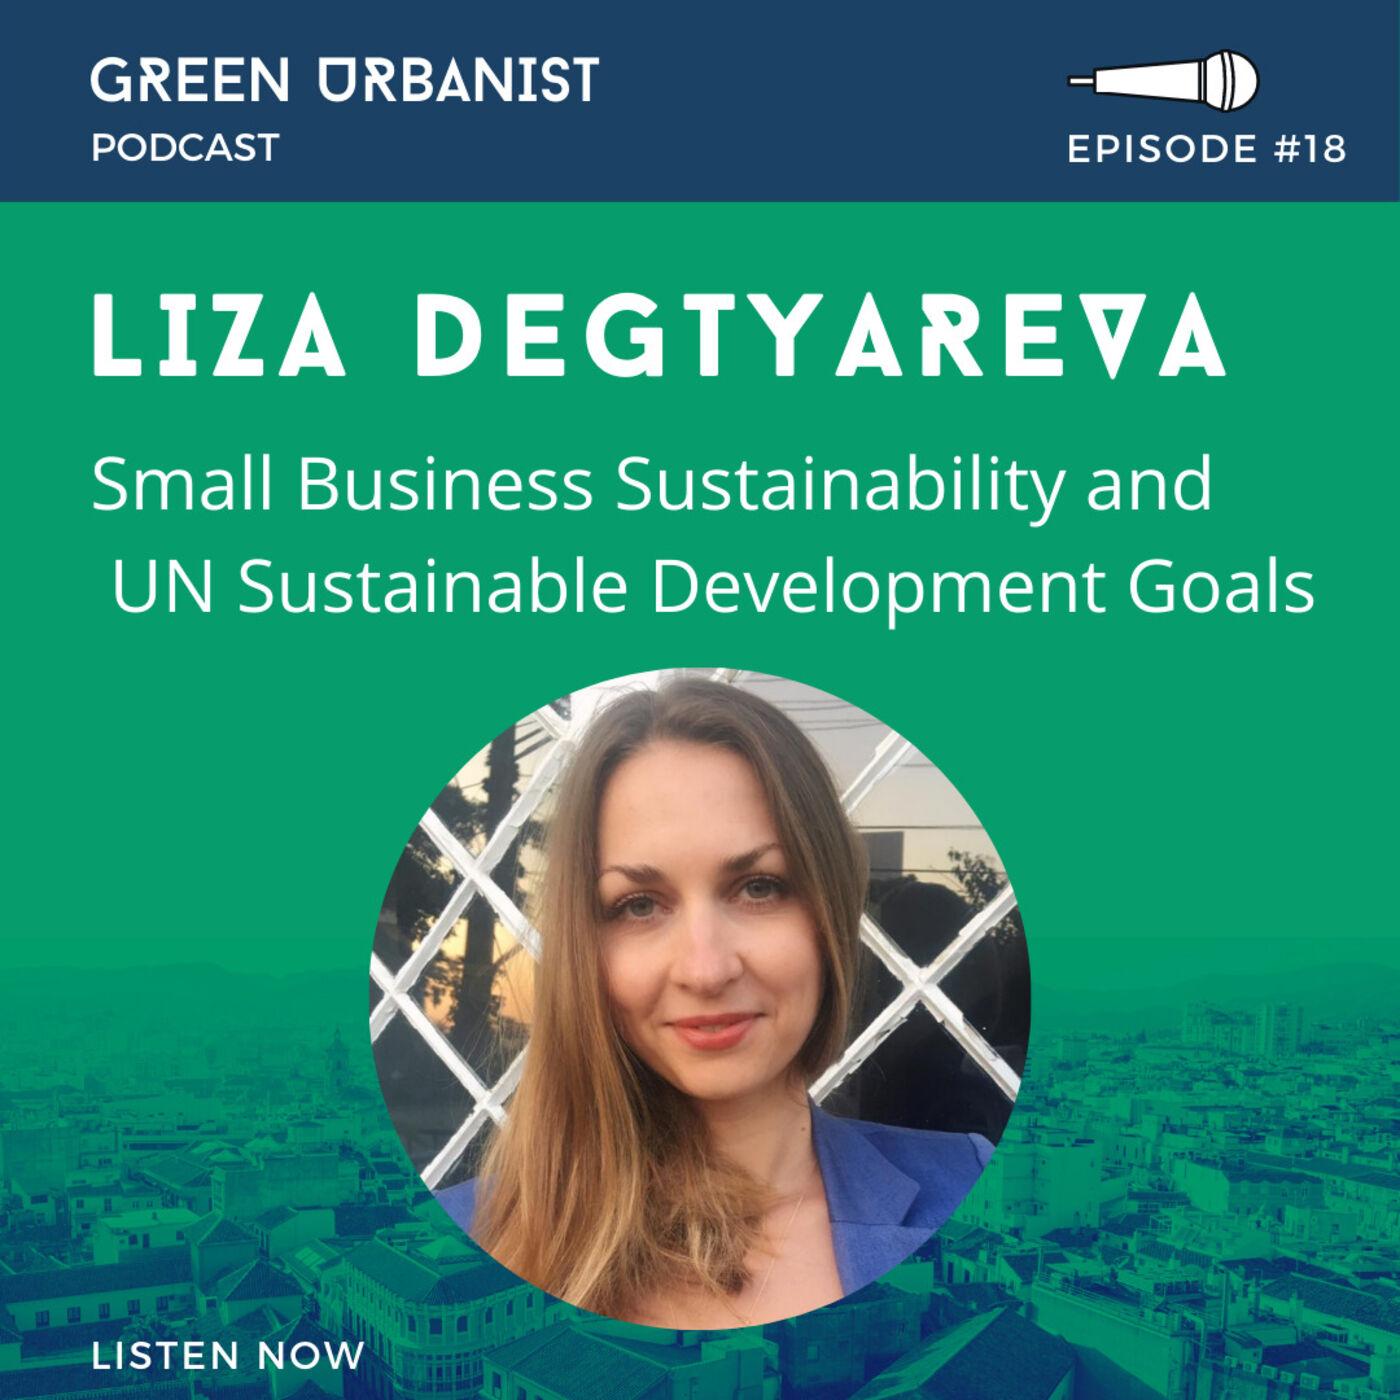 #18: Liza Degtyareva (4D Sustainability) - Small Business Sustainability, Regenerative Economy, and UN Sustainable Development Goals